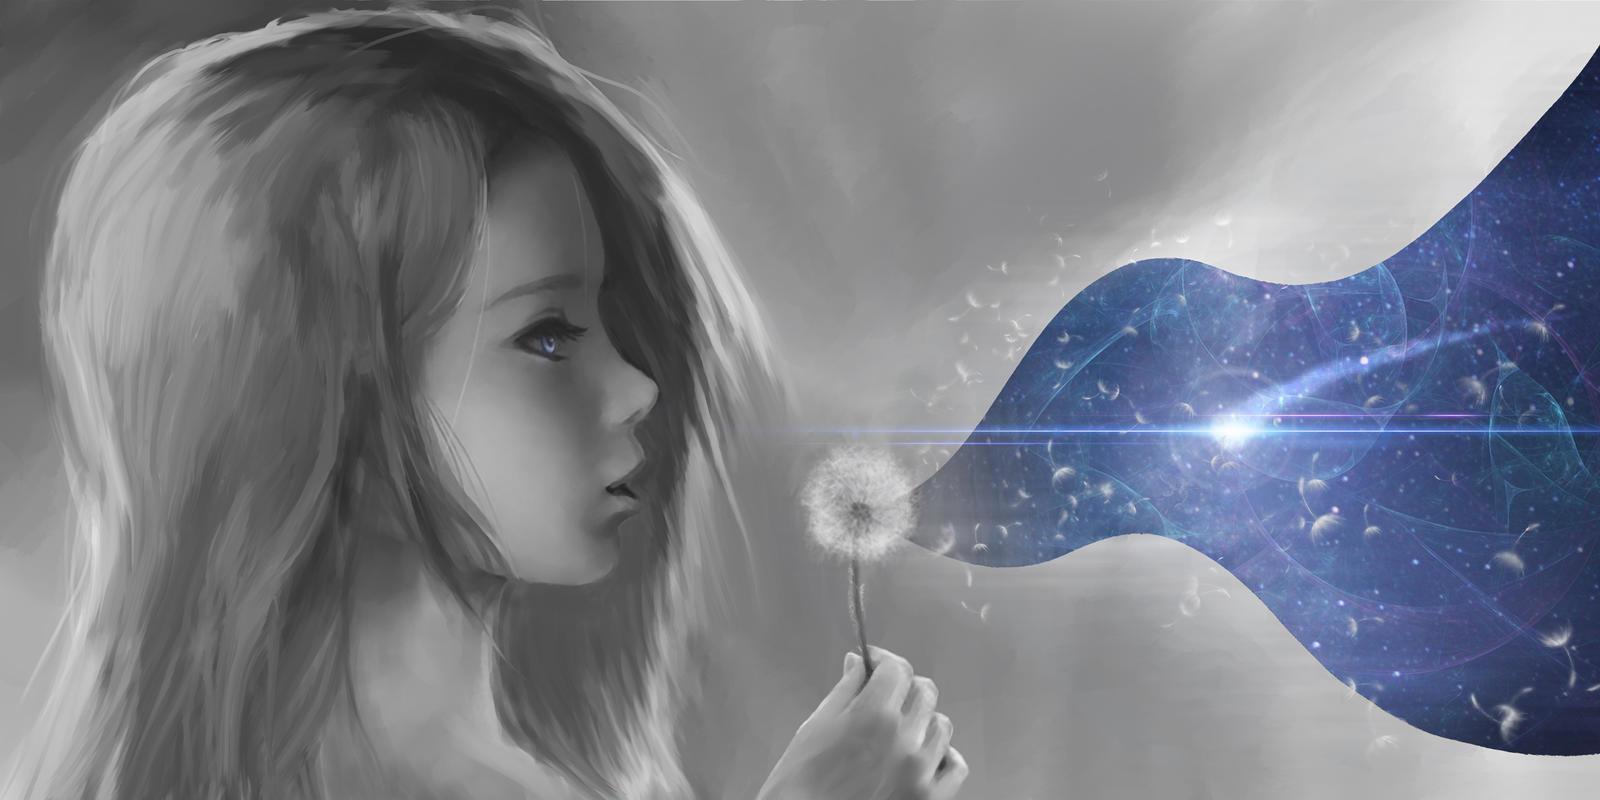 The Wish by Brandon-Ellis